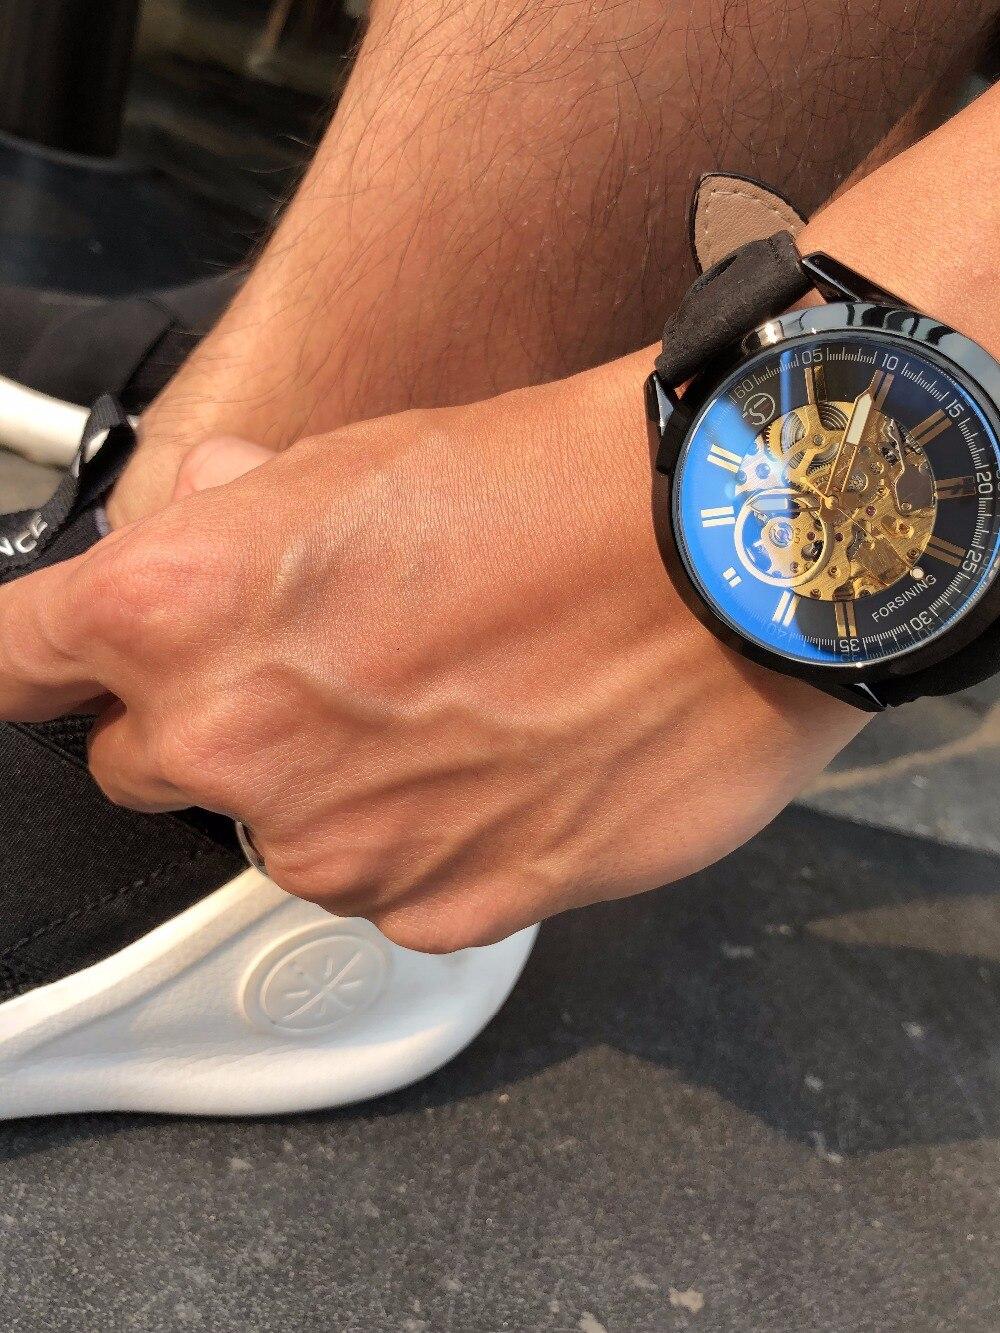 HTB1gL.Je138SeJjSZFPq6A vFXao Forsining 2017 Mens Casual Sport Watch Genuine Leather Top Brand Luxury Army Military Automatic Men's Wrist Watch Skeleton Clock